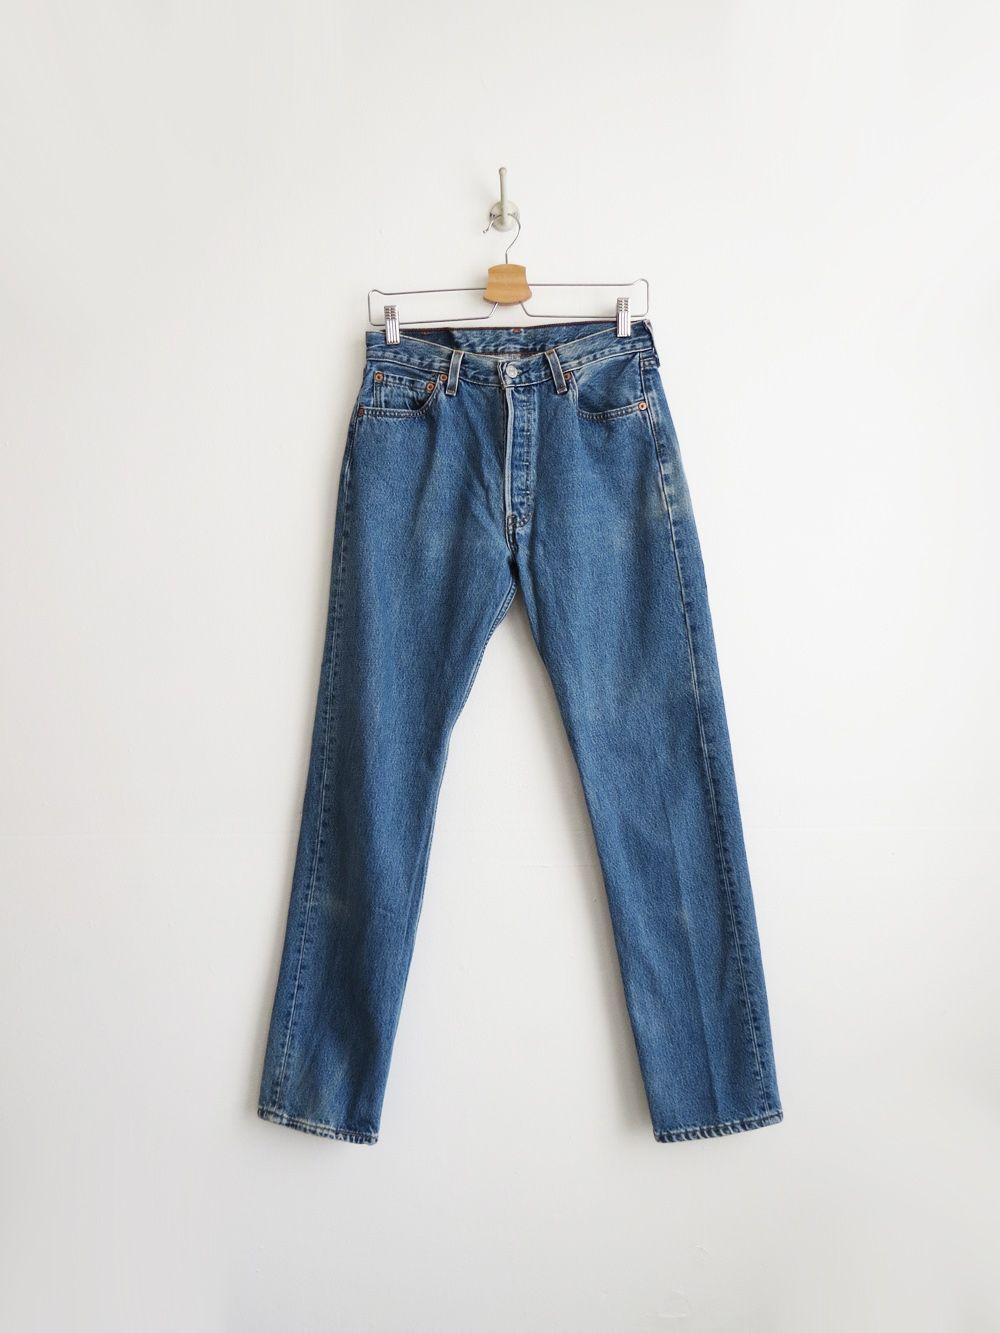 DENIM - Denim trousers 28.5 DZVzrNPe